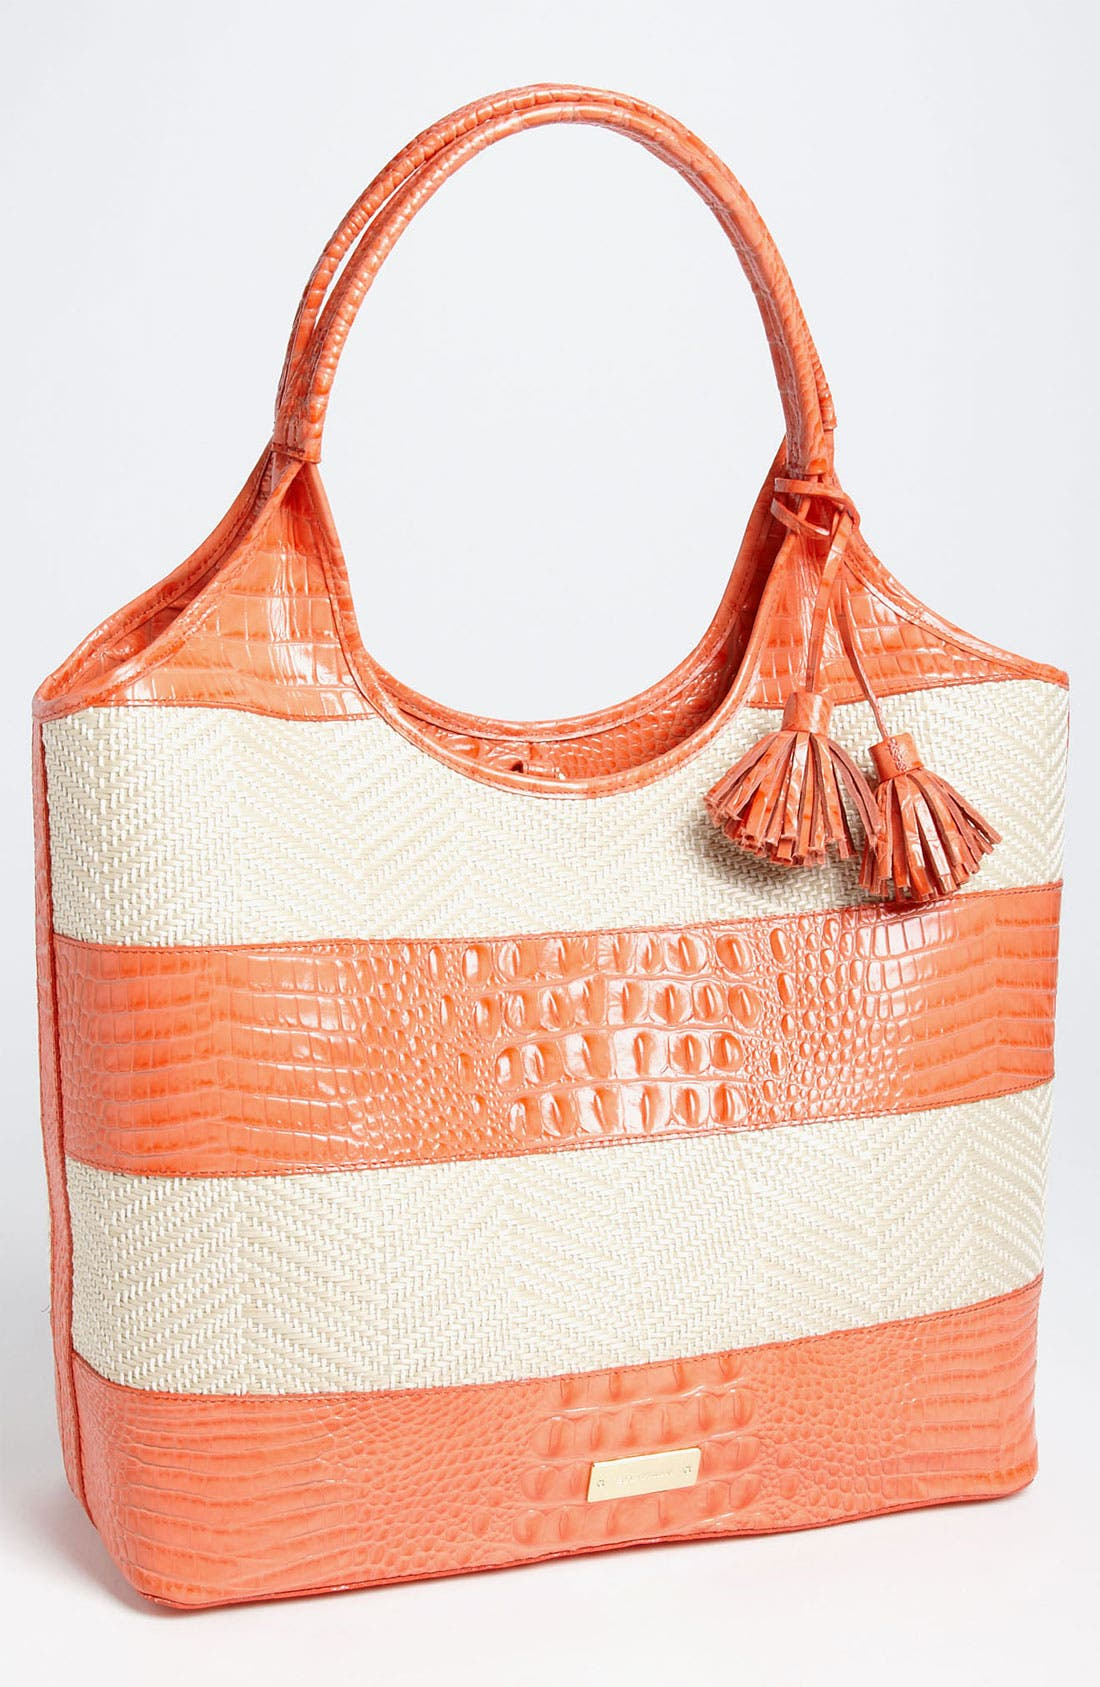 Alternate Image 1 Selected - Brahmin 'Vineyard' Leather & Raffia Shopper